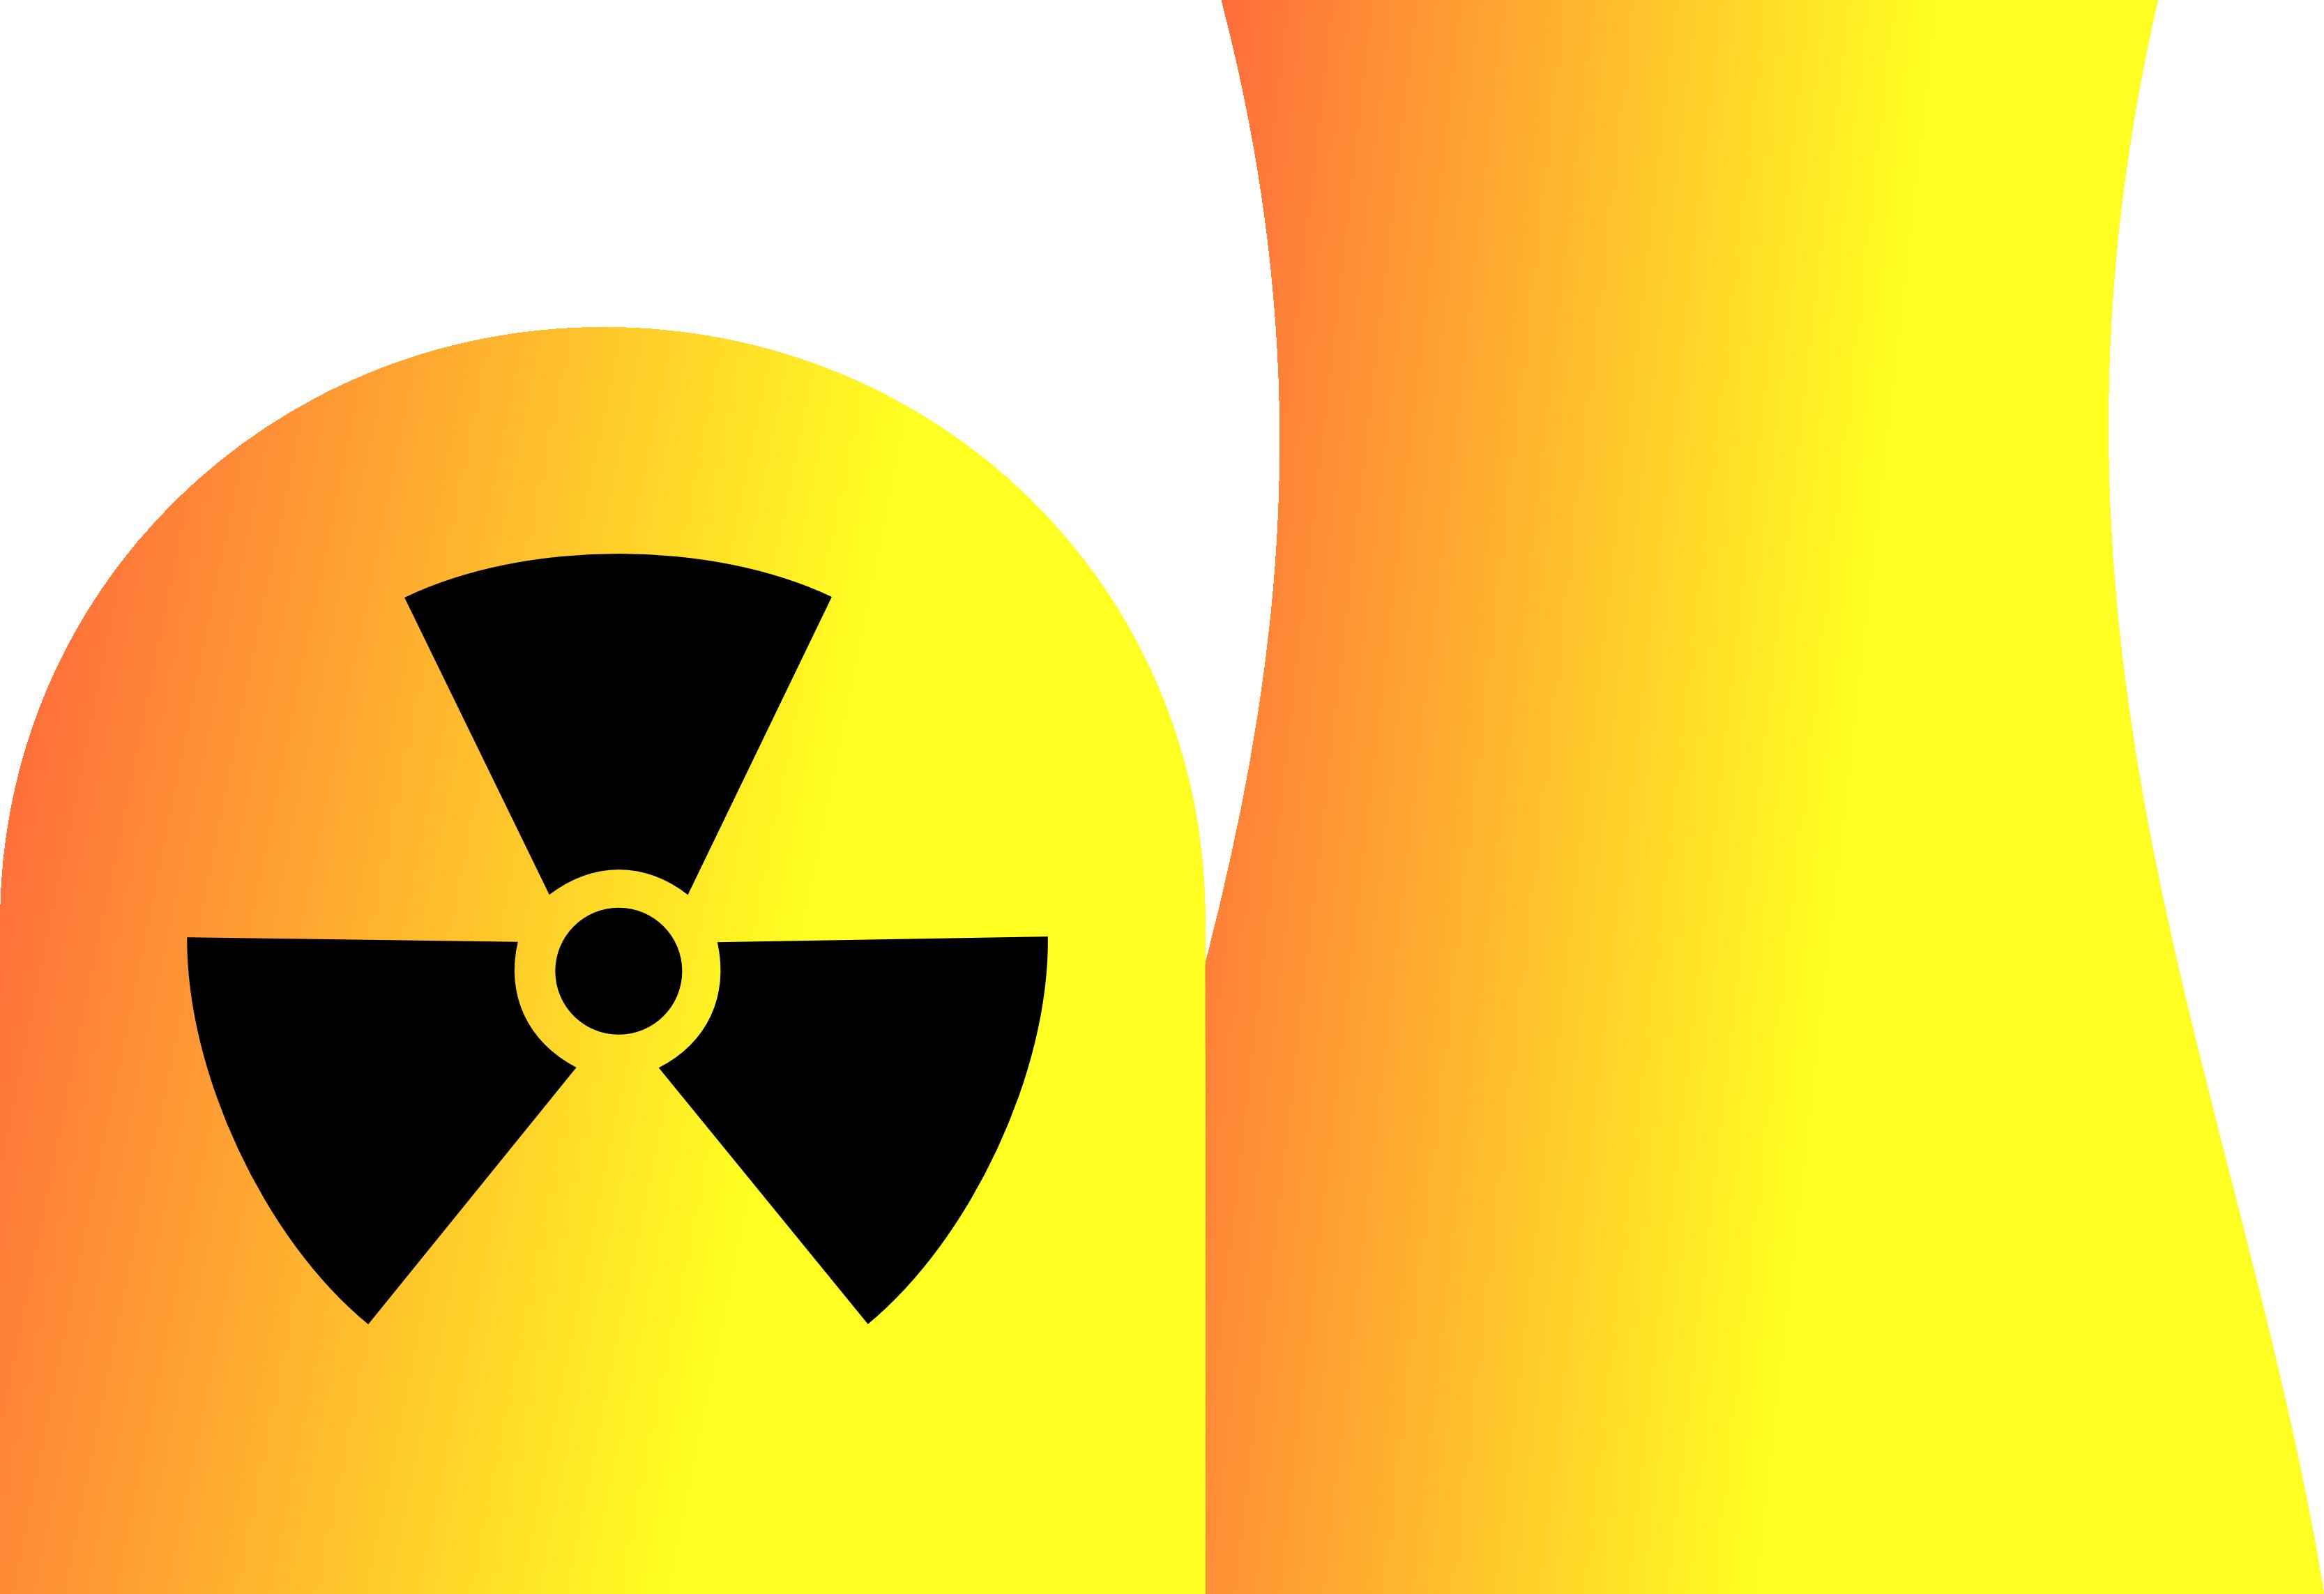 atomkraftwerk clipart - photo #27